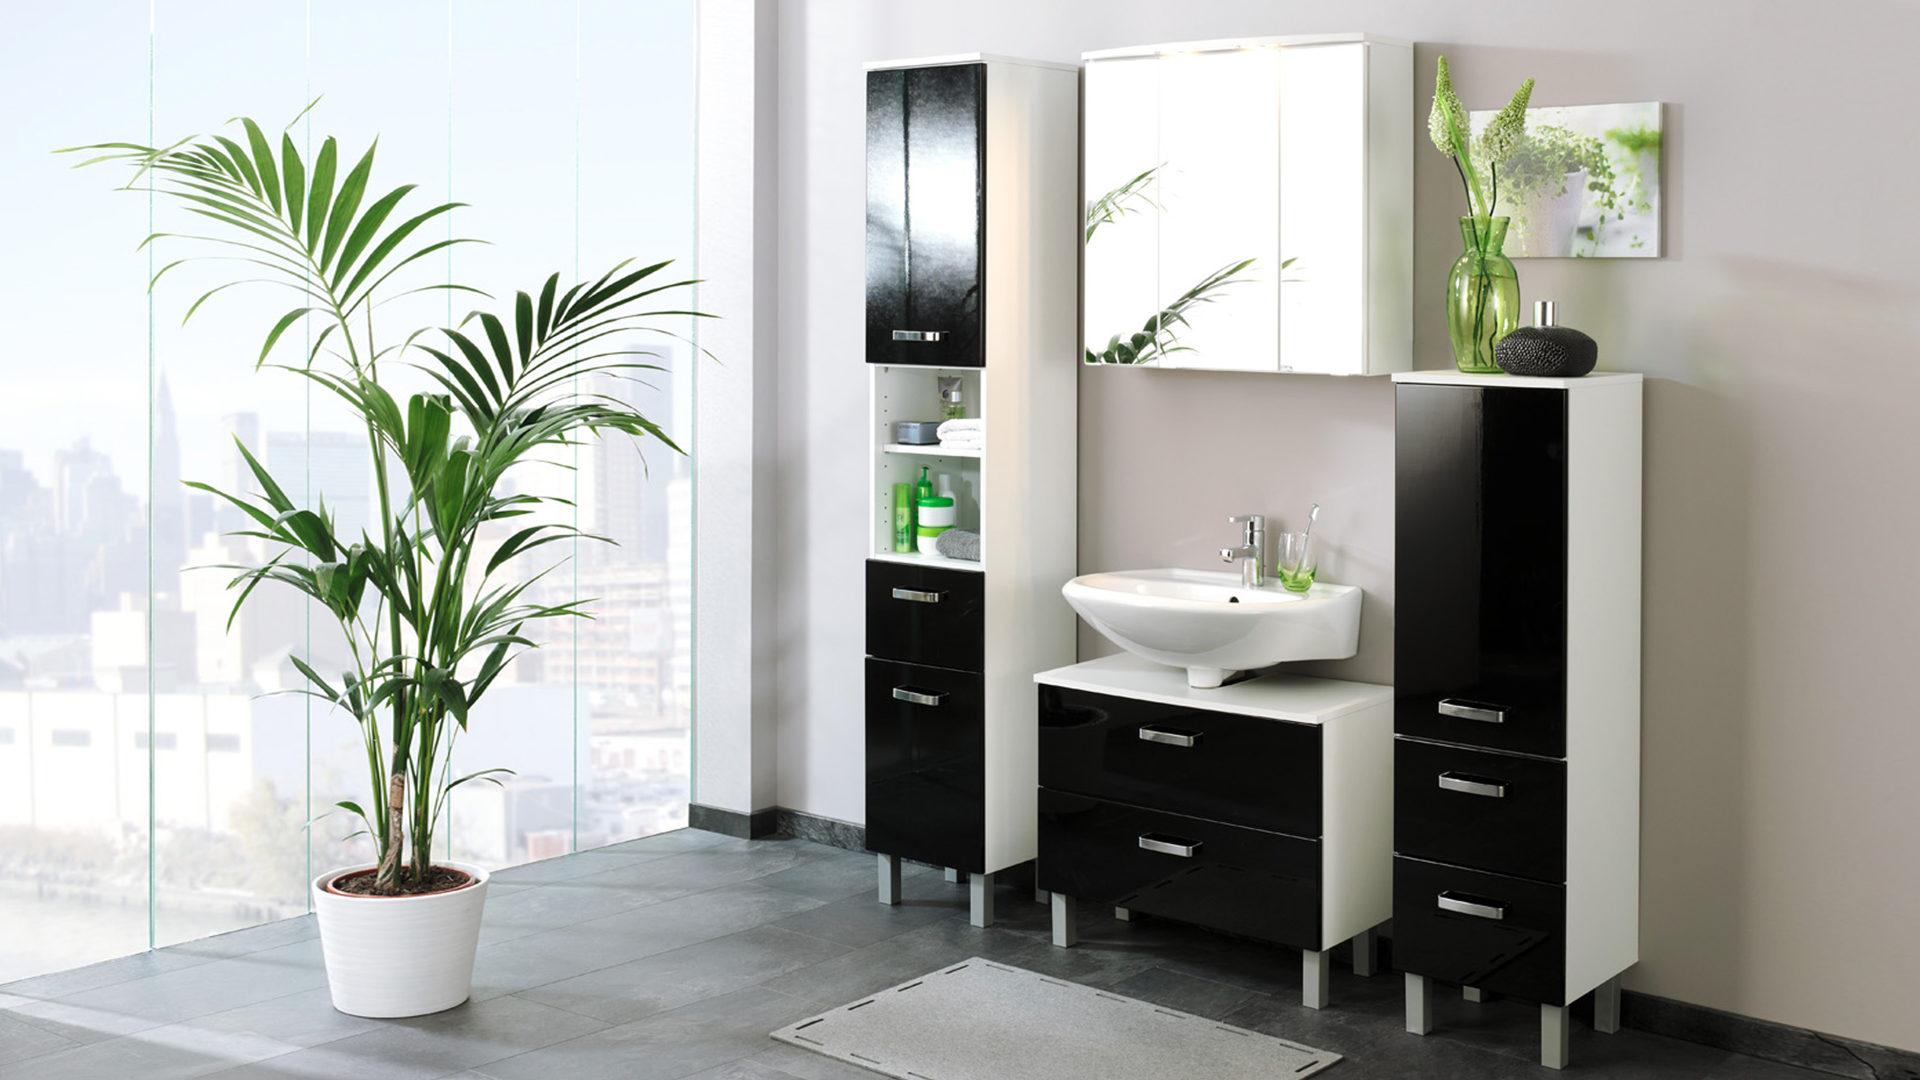 Exklusive Badmöbel Hersteller exklusive badmöbel frankfurt reuniecollegenoetsele